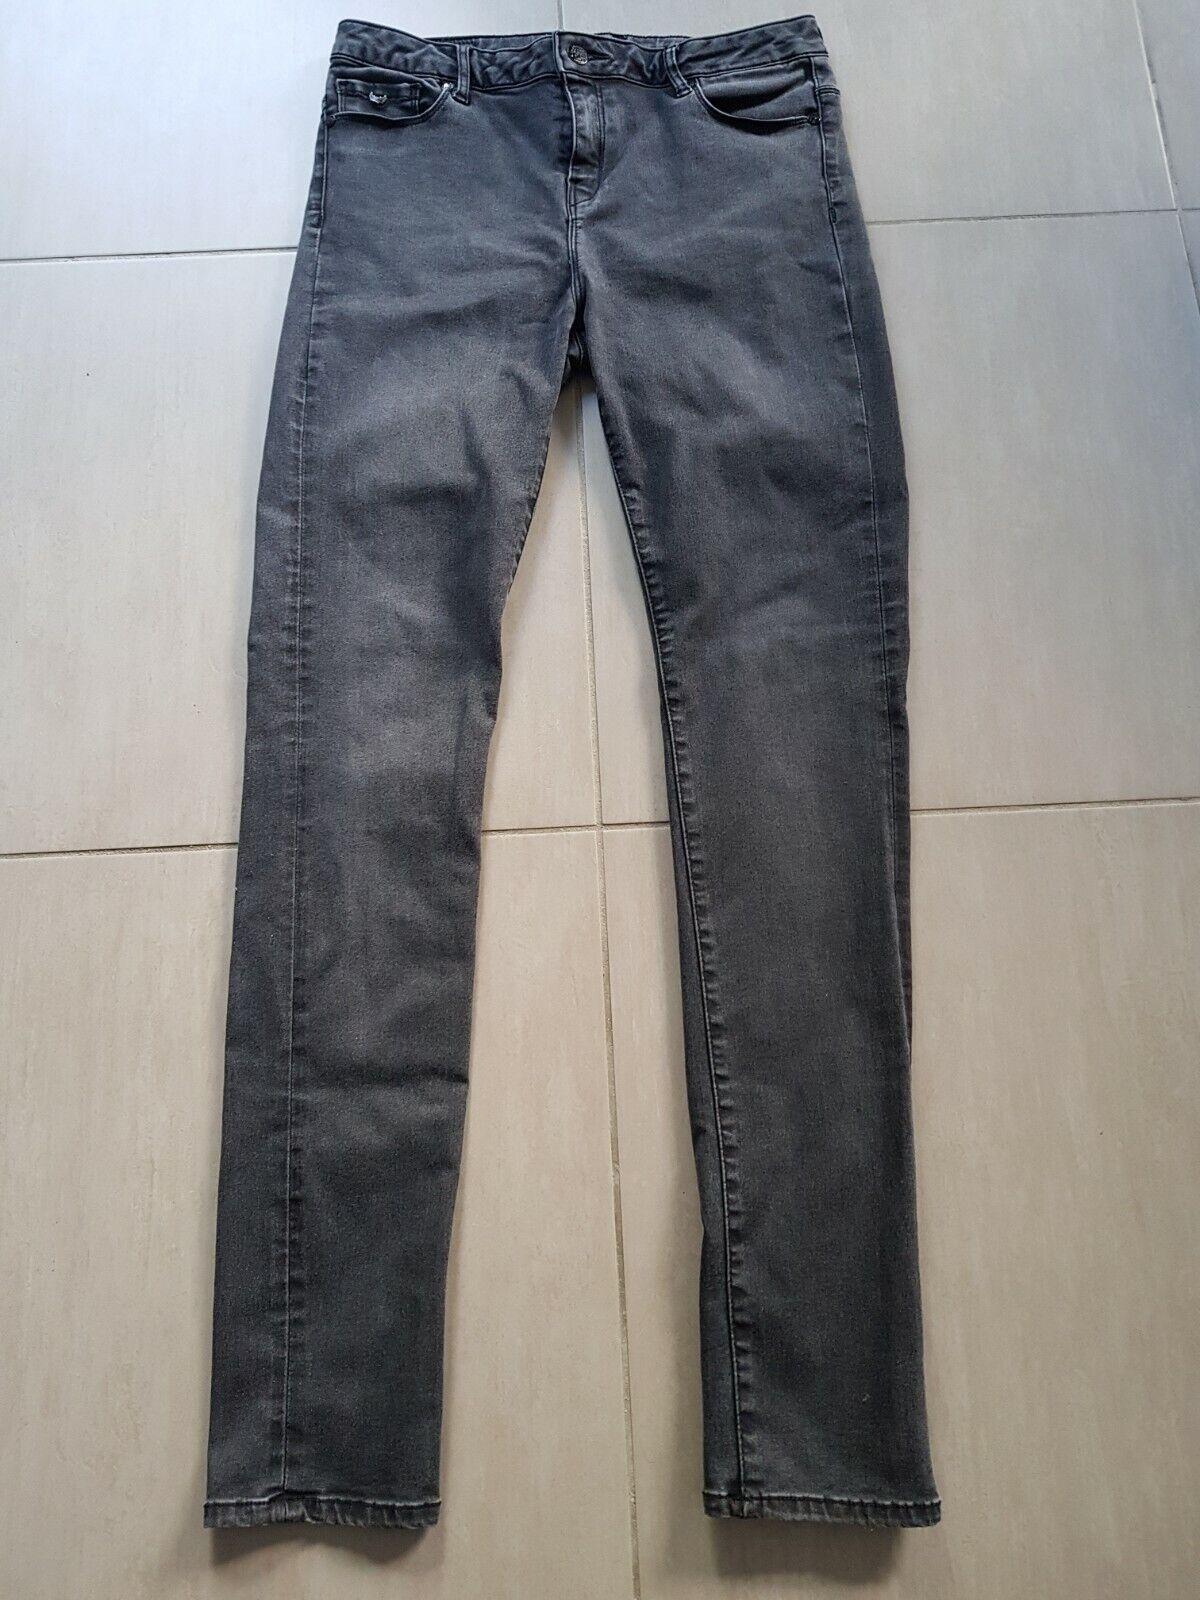 Pantalon jean skinny noir - kaporal 5 - taille 39 fr / us 29